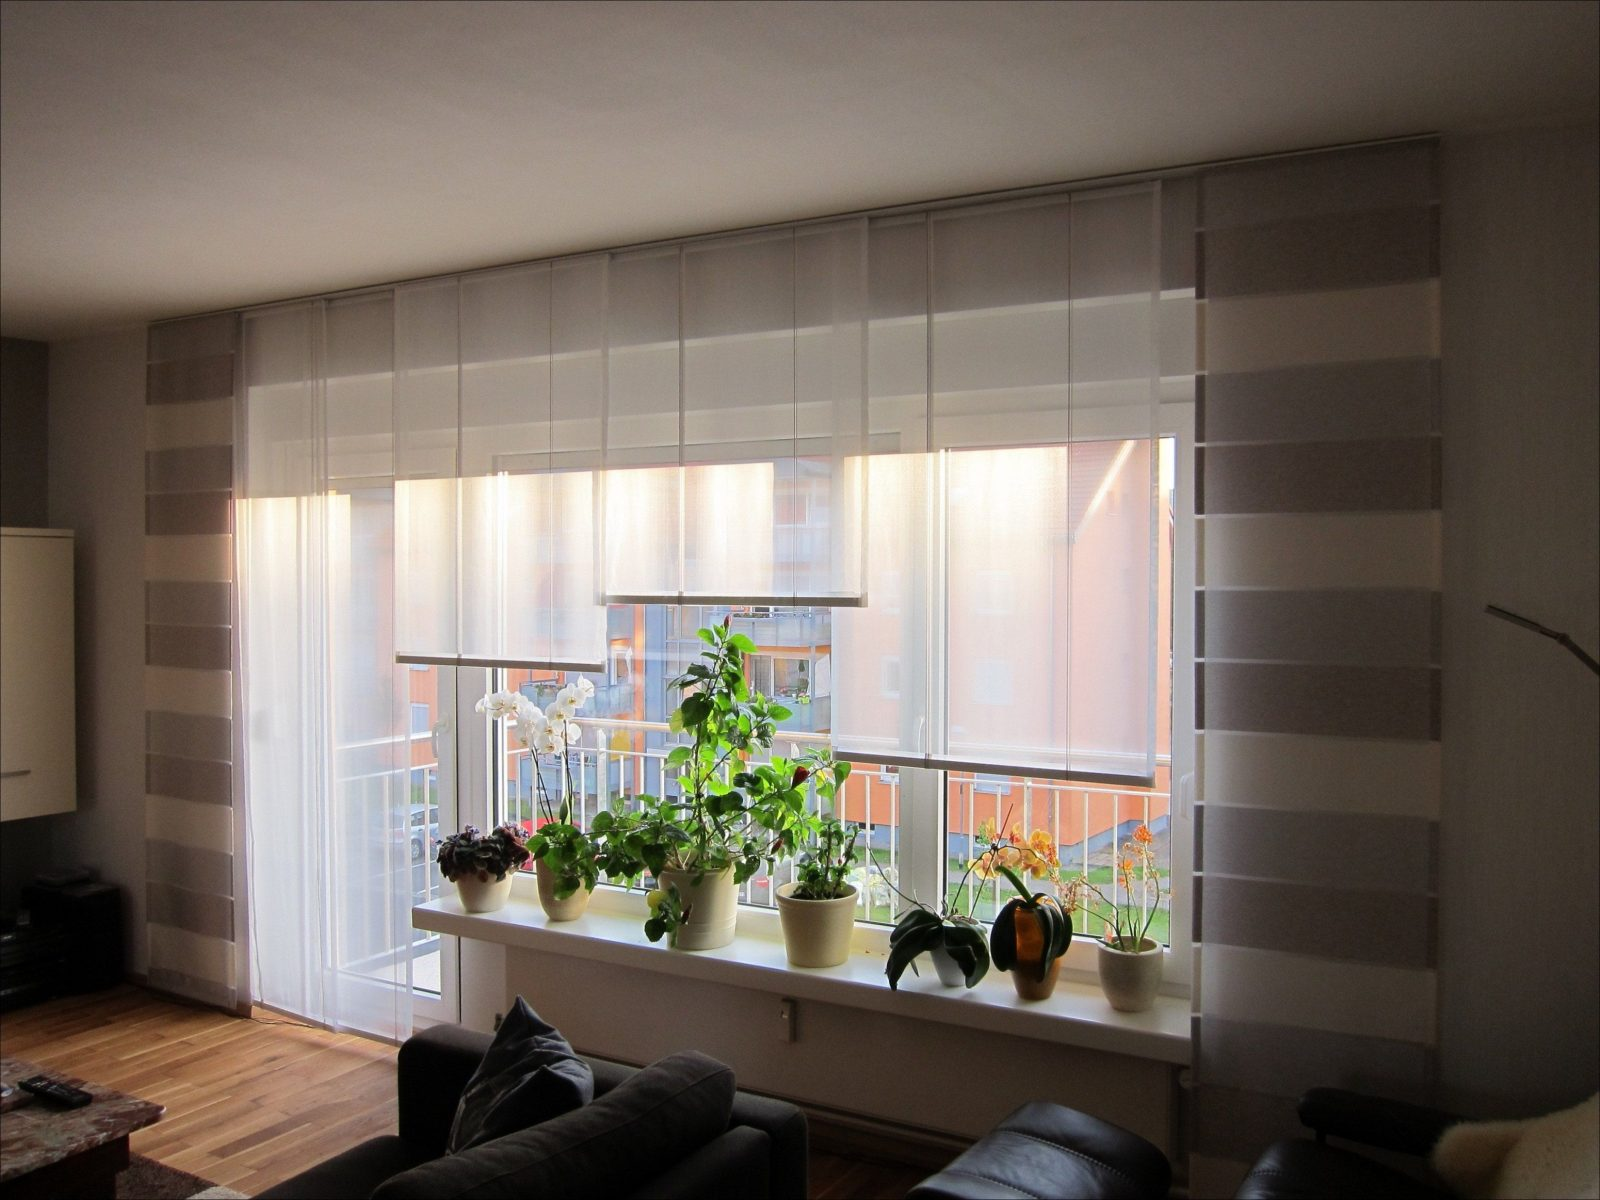 gardinen vorschl ge f r balkont ren haus design ideen. Black Bedroom Furniture Sets. Home Design Ideas